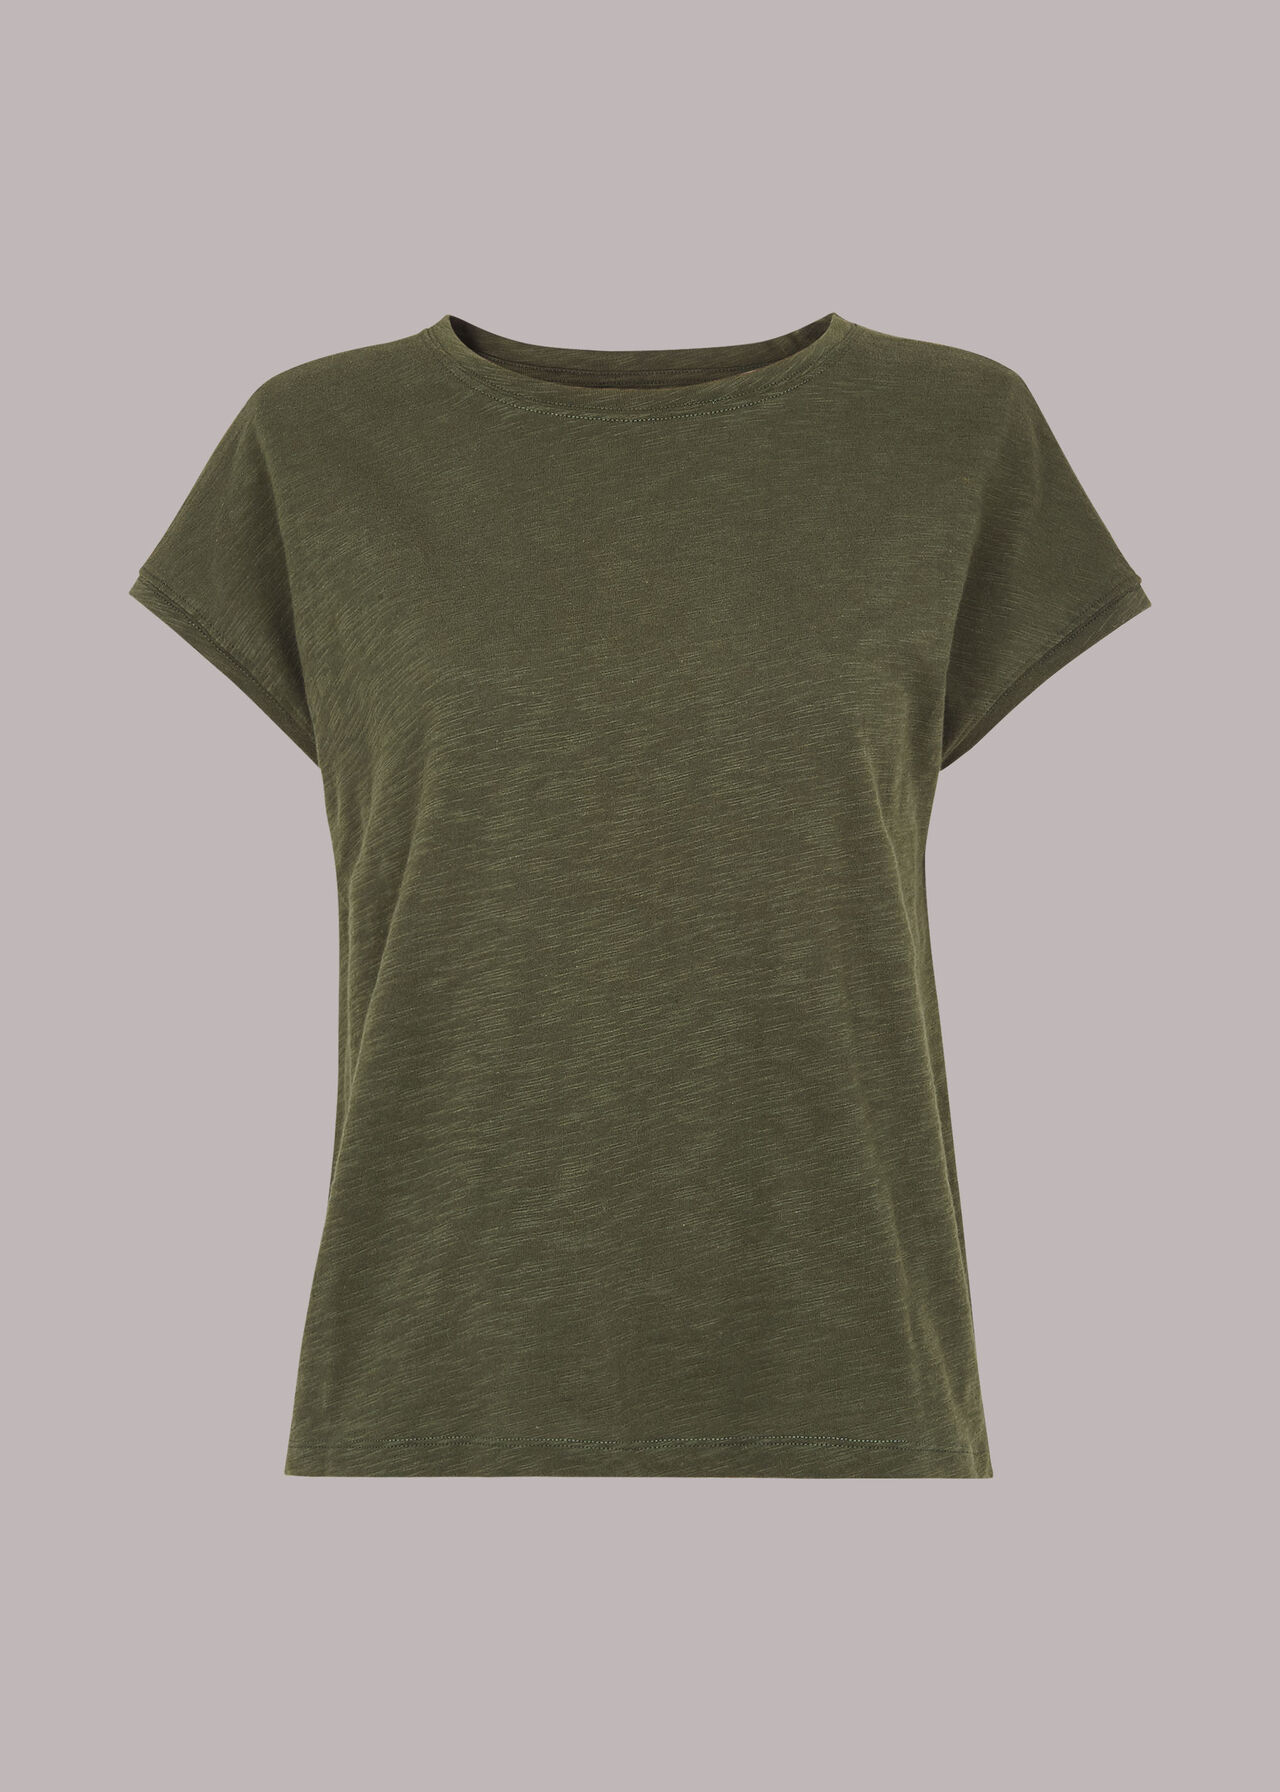 Minimal Cap Sleeve Tee Khaki